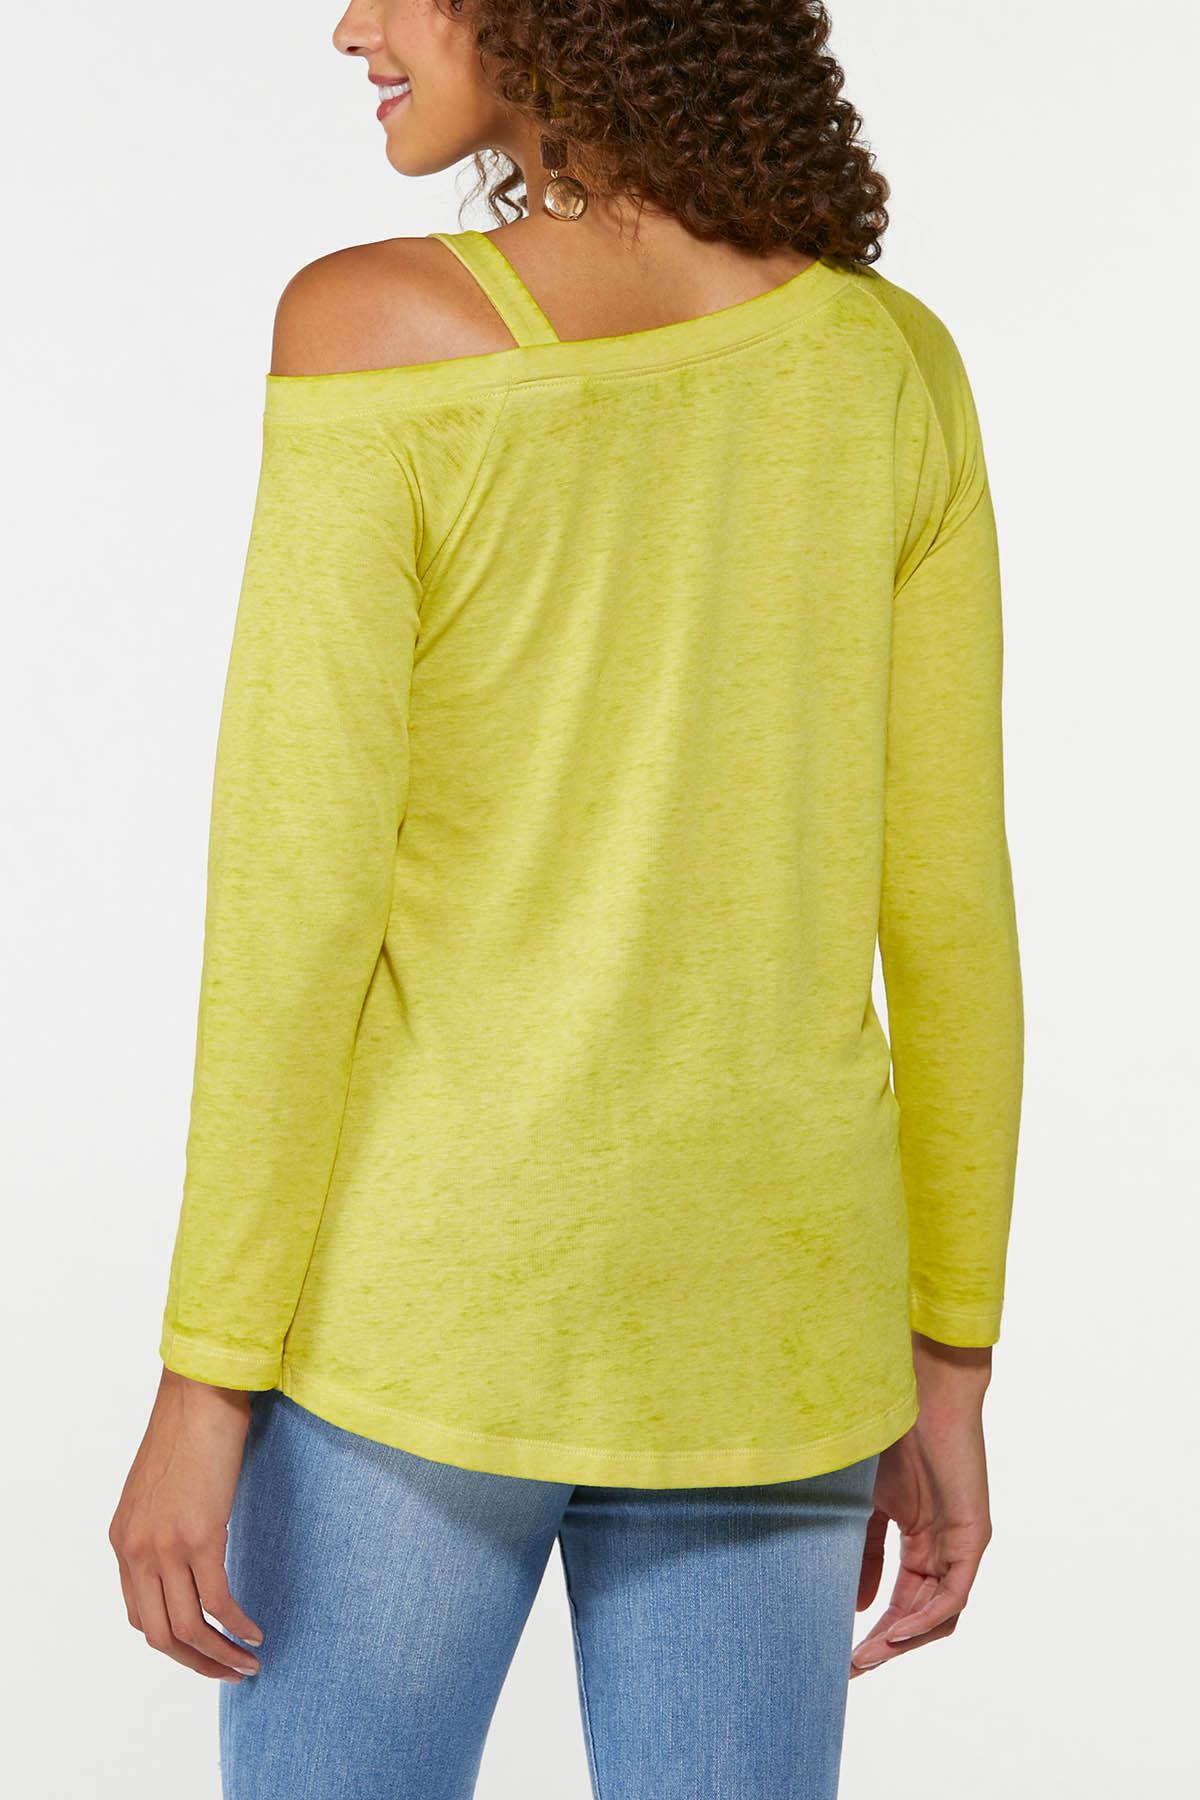 One Shoulder Twist Top (Item #44702550)